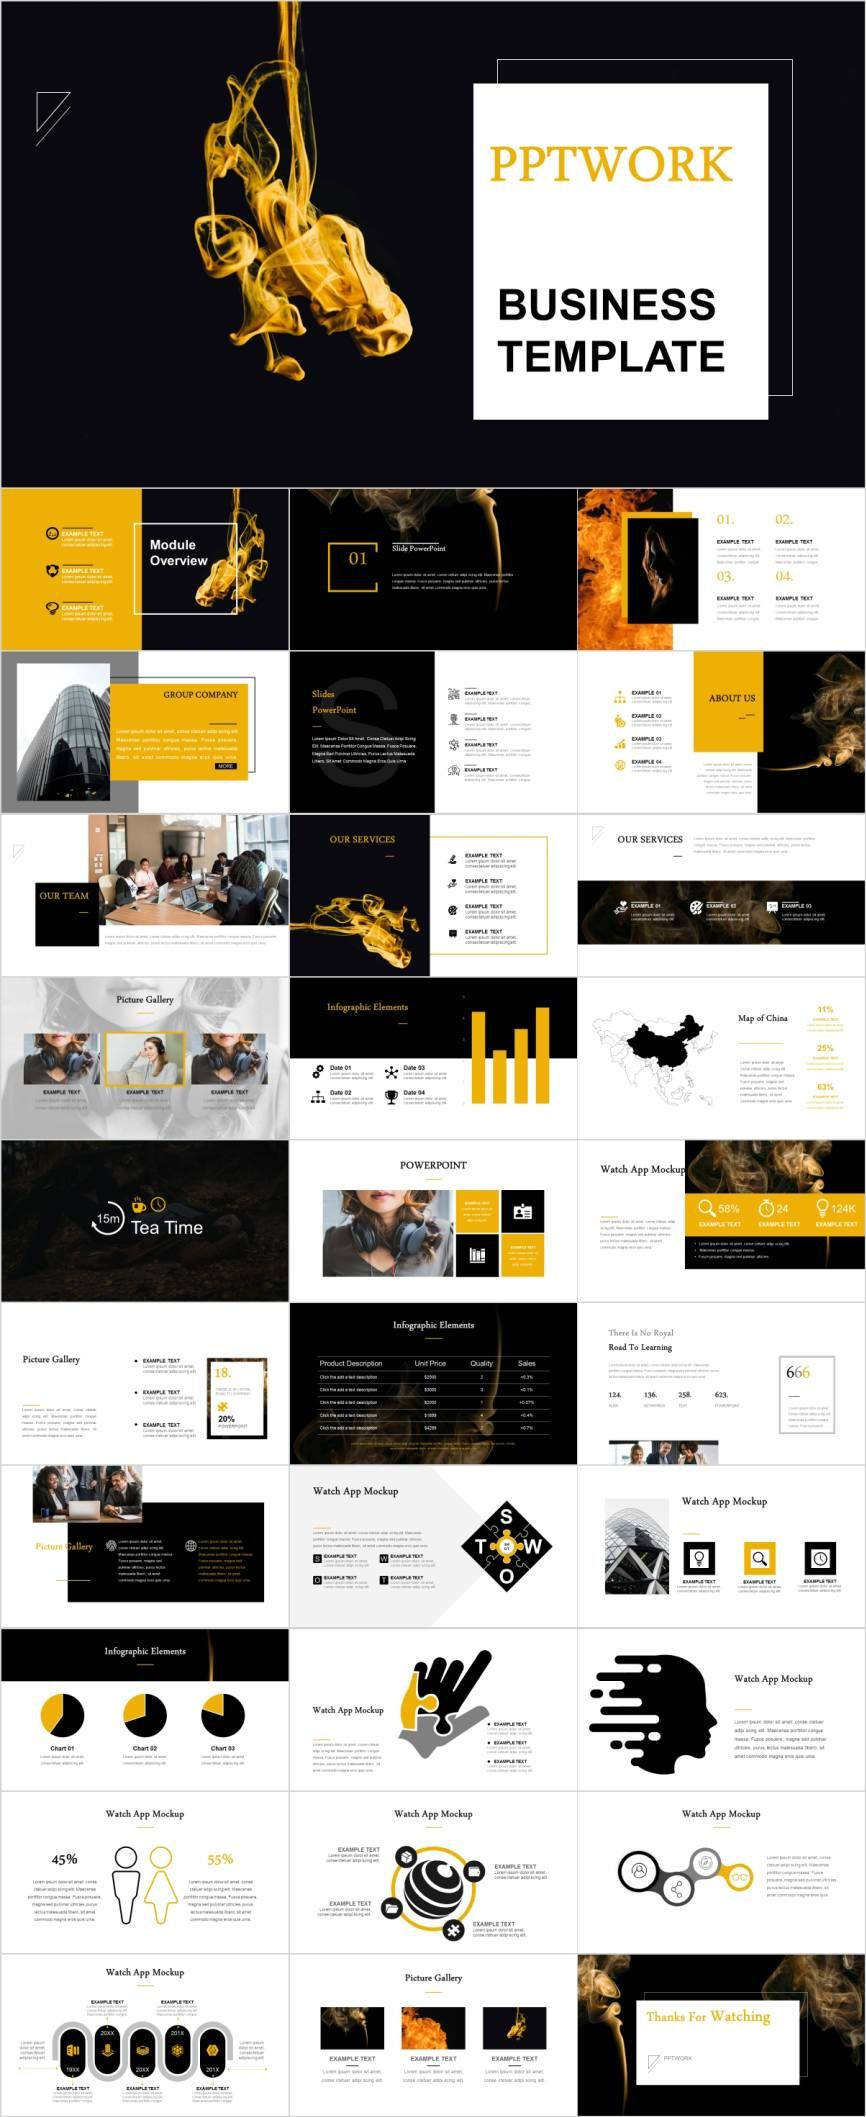 Business Design Swot Analysis Powerpoint Template Pcslide Com